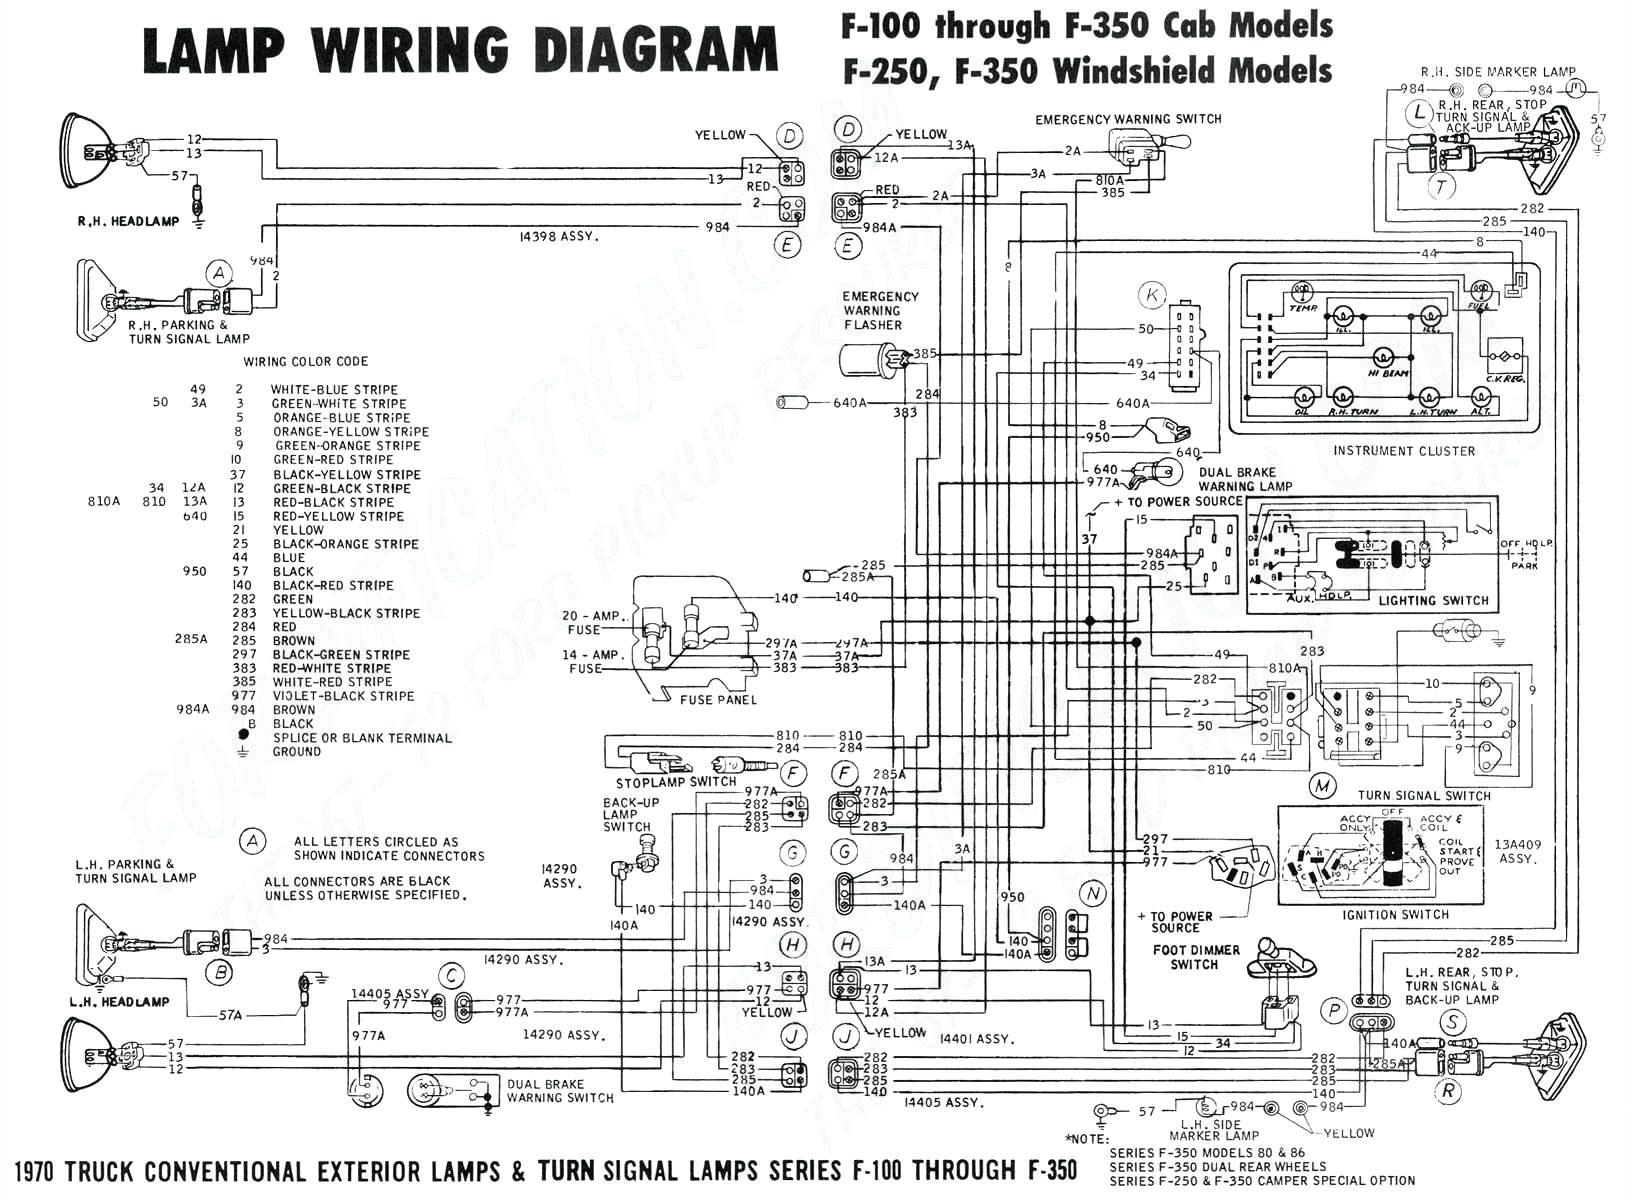 tc1 heater wiring diagram wiring diagram view proteam super coach wiring diagram supercoach wiring diagram